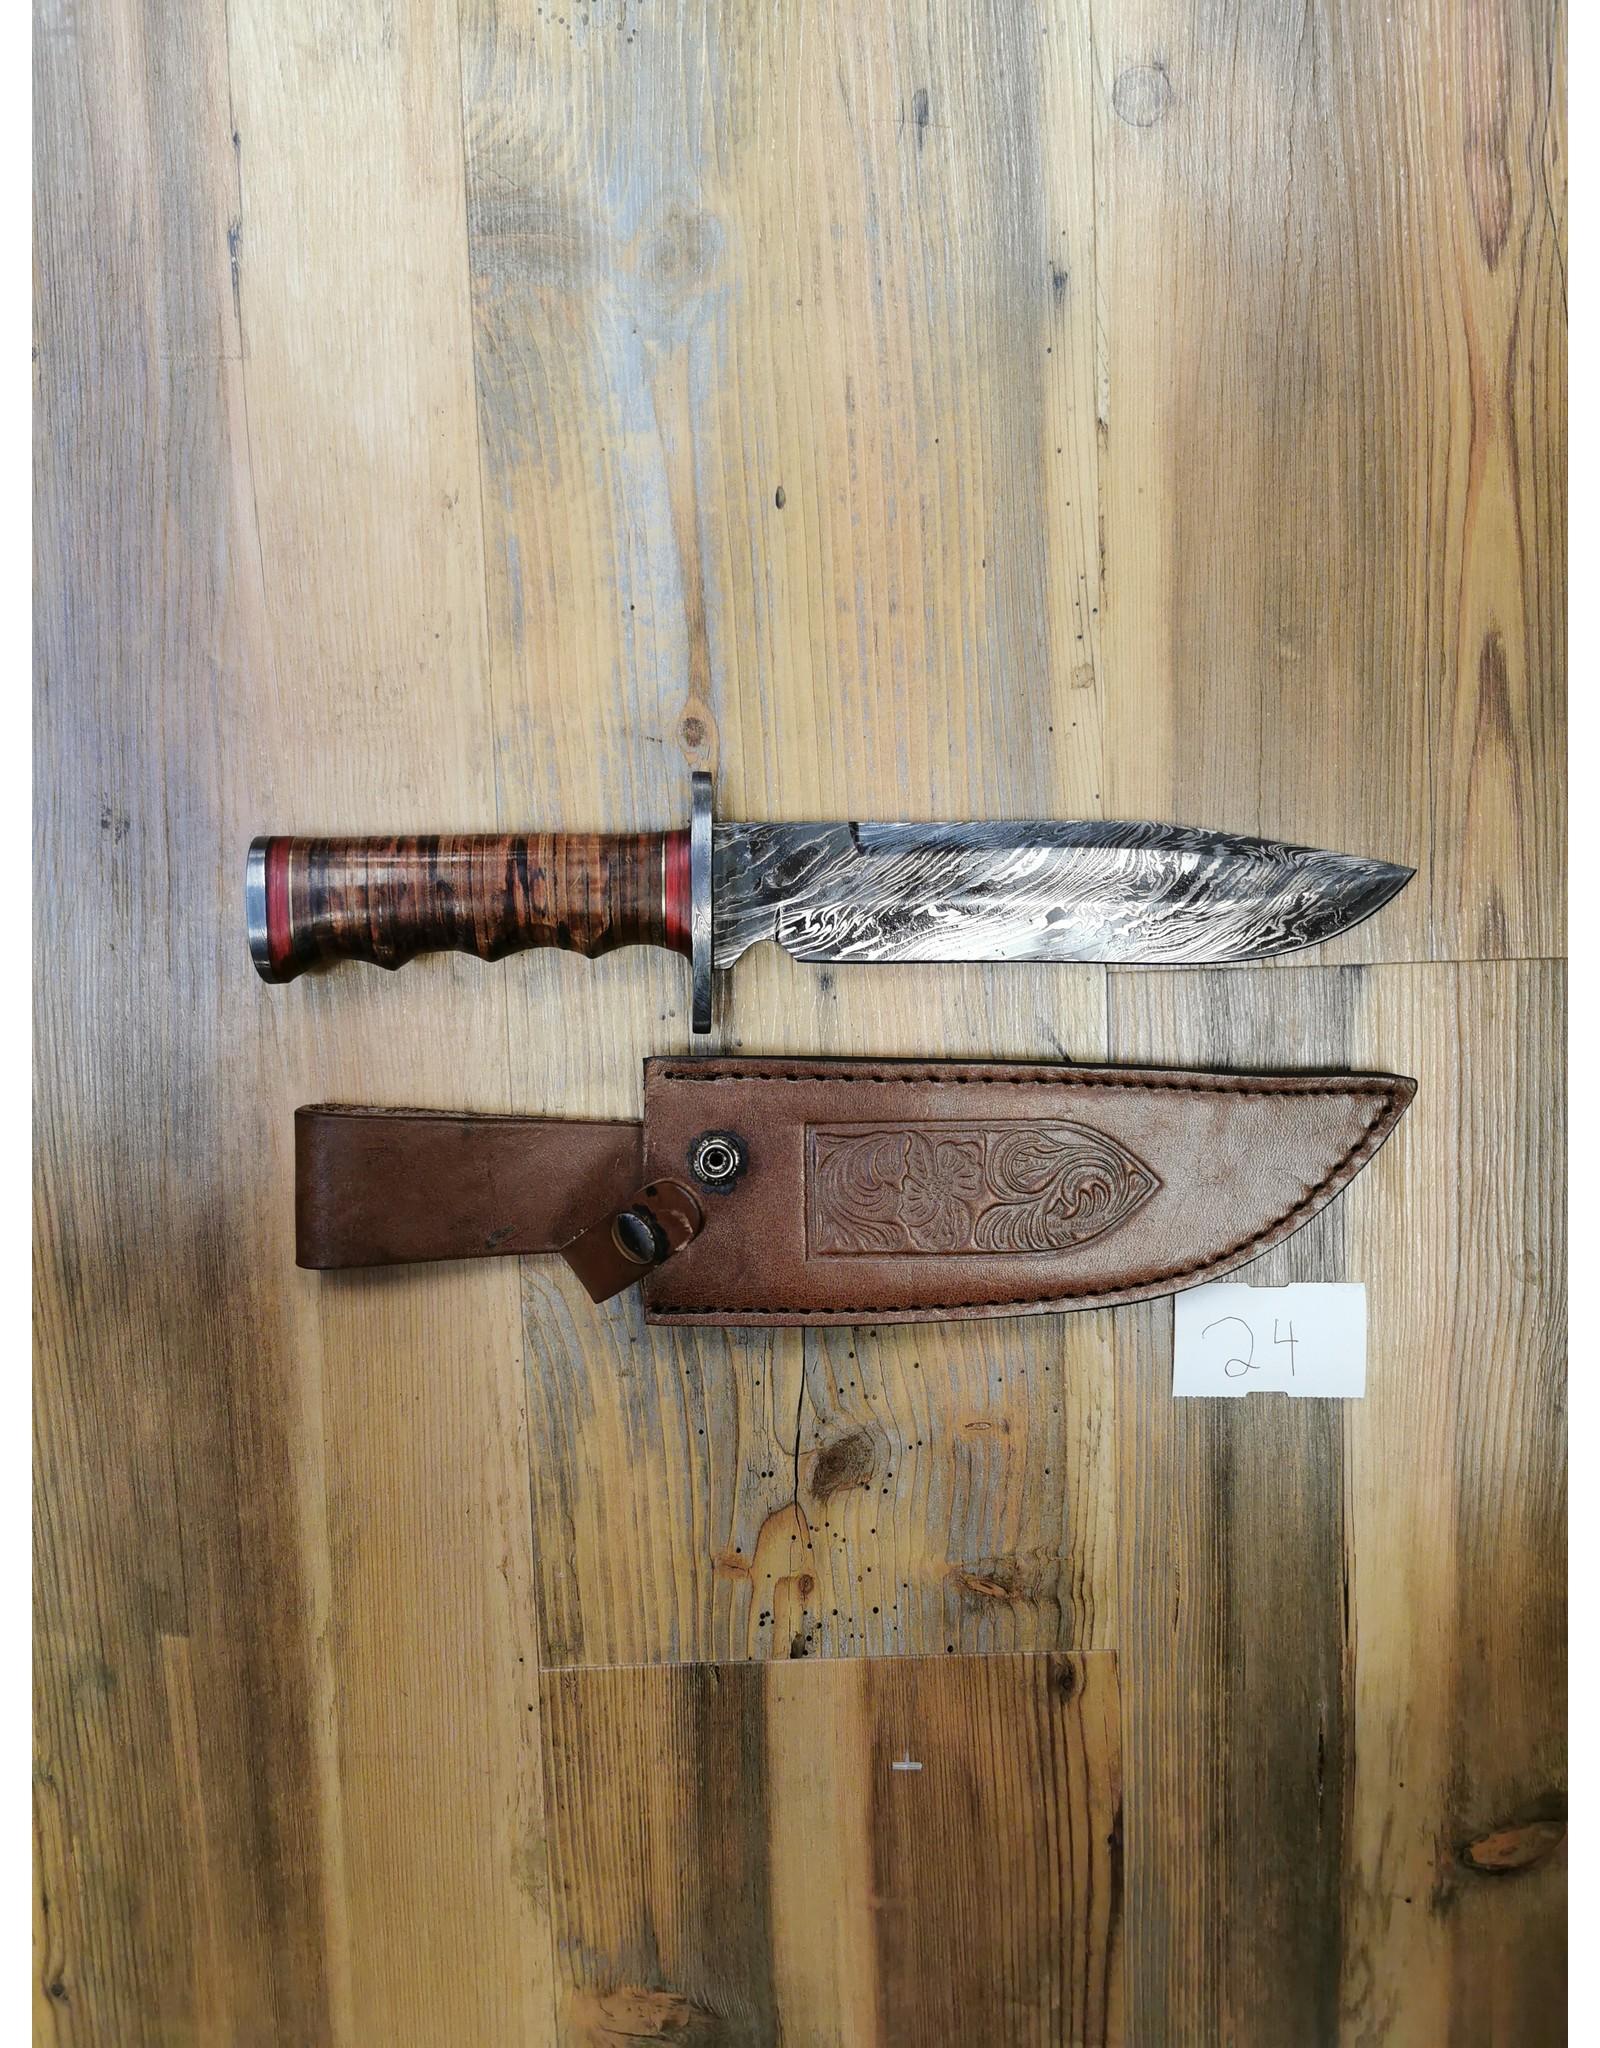 BAJWA ENTERPRISES DAMASCUS LARGE KNIFE #24